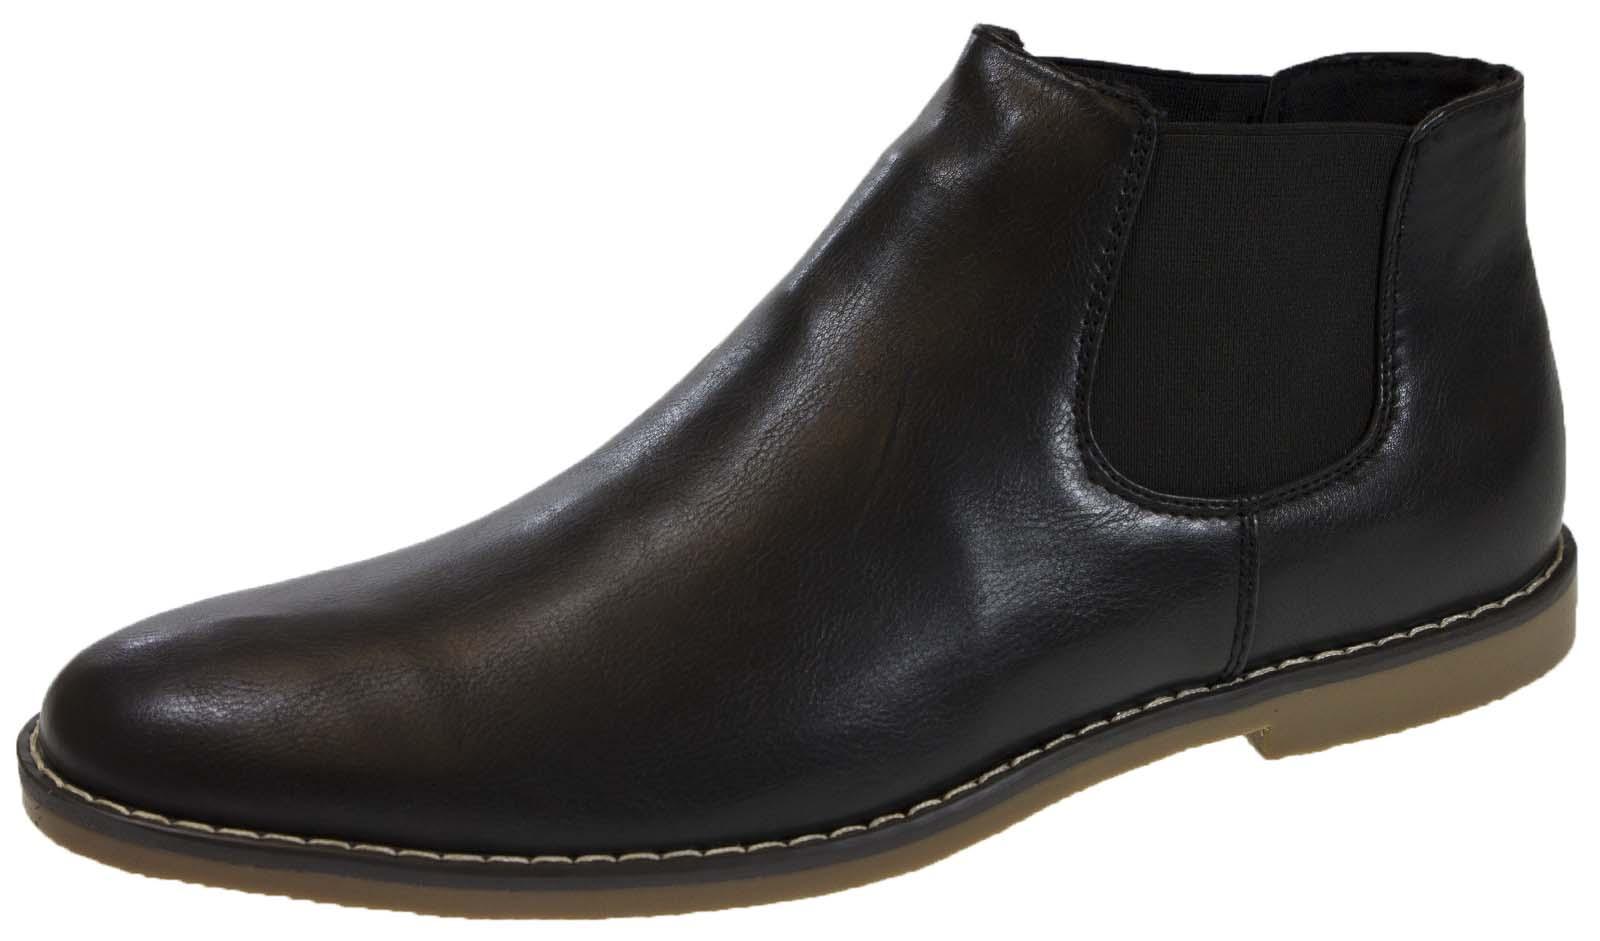 mens chelsea ankle boots slip on faux suede smart desert